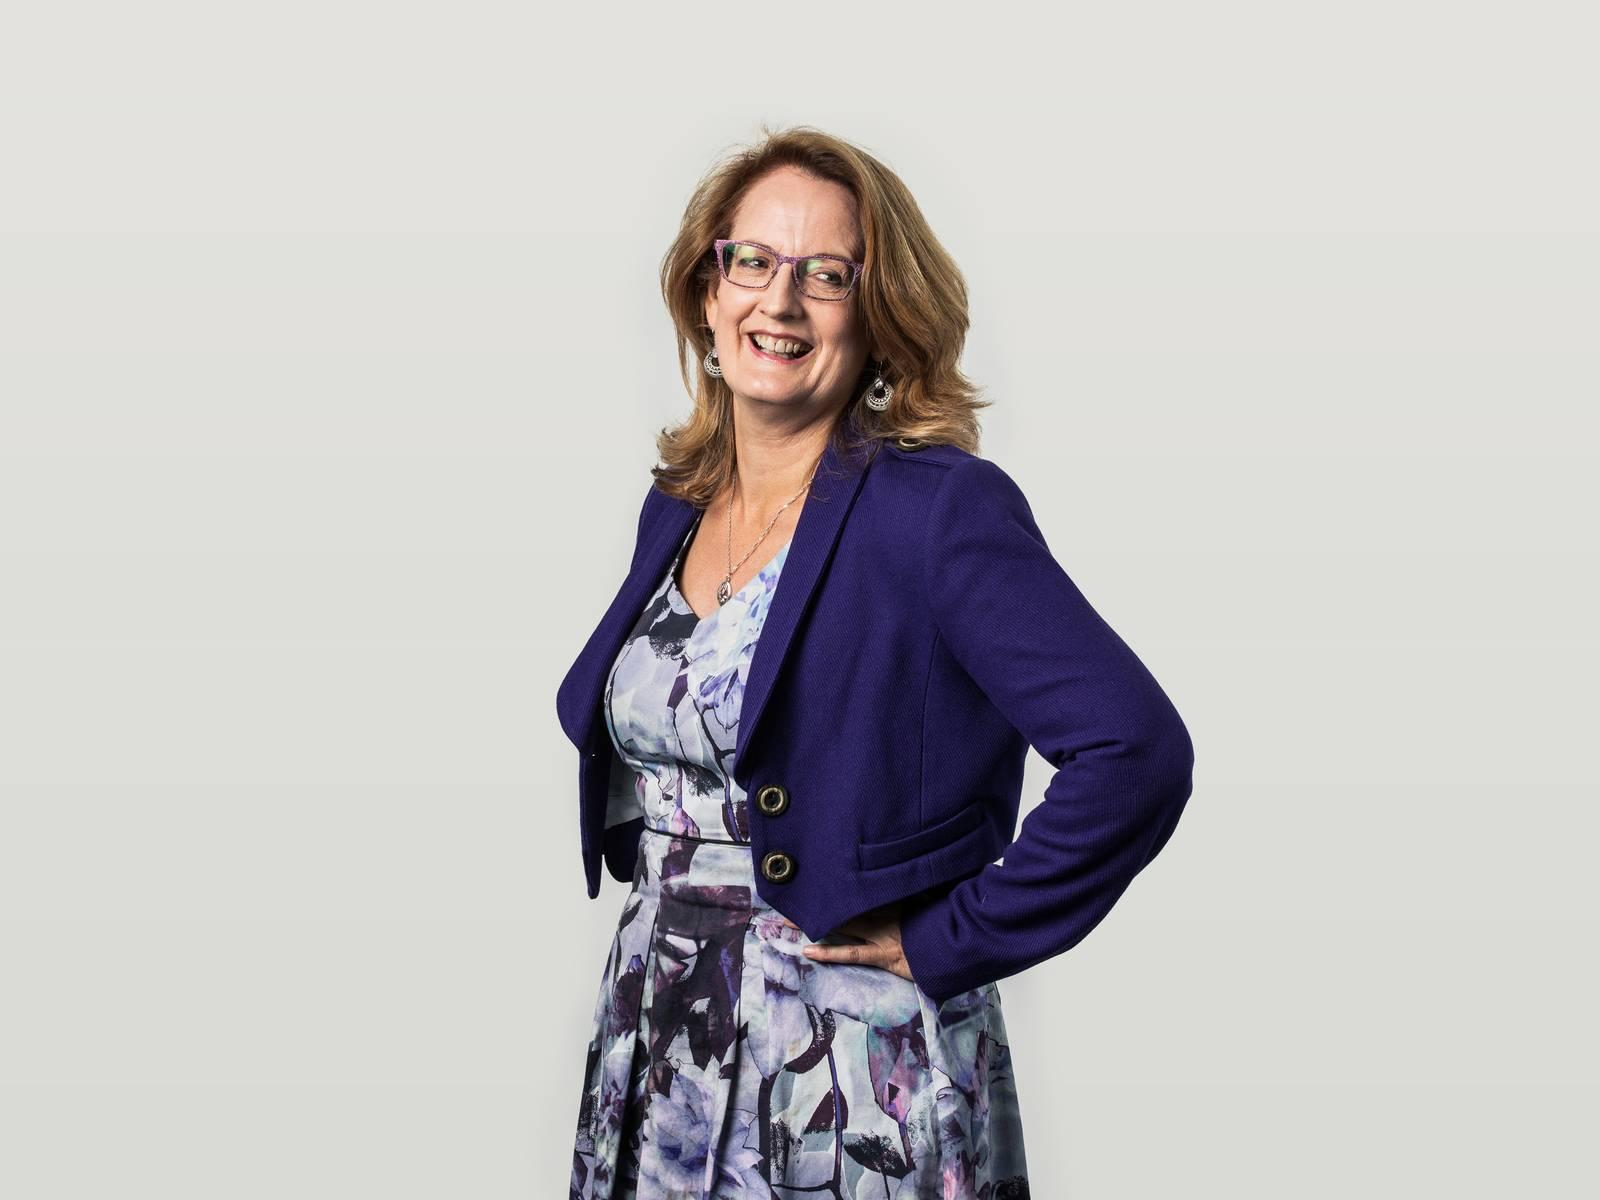 A profile image of Sharon Talbot